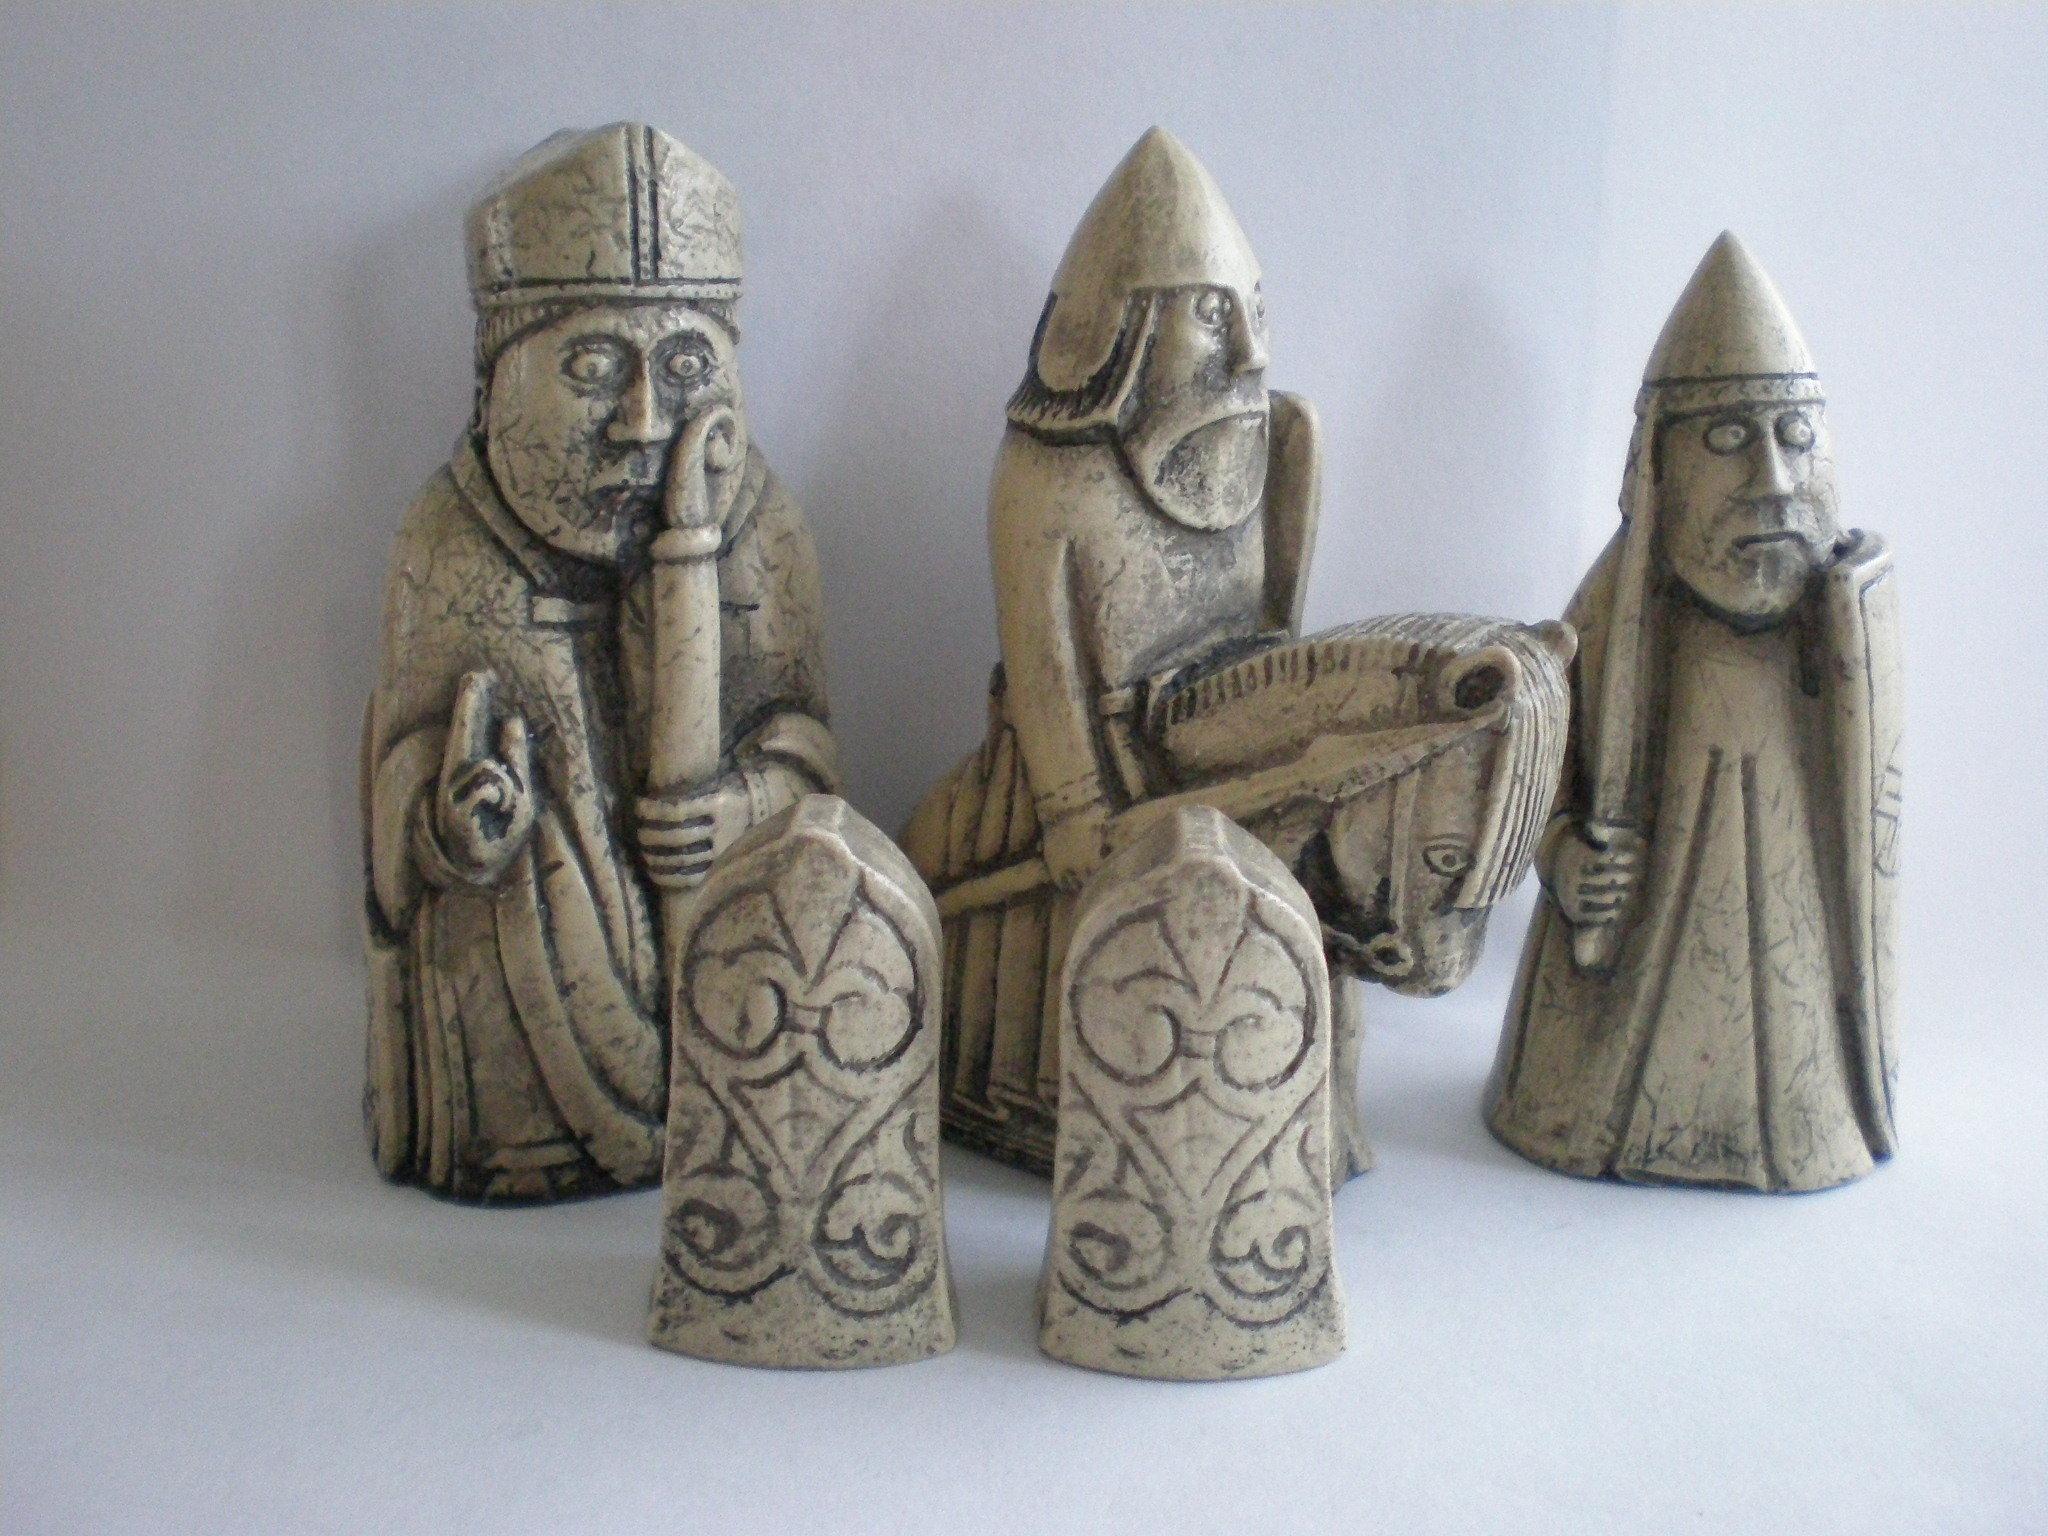 Chess sets - Lewis chessmen set ...